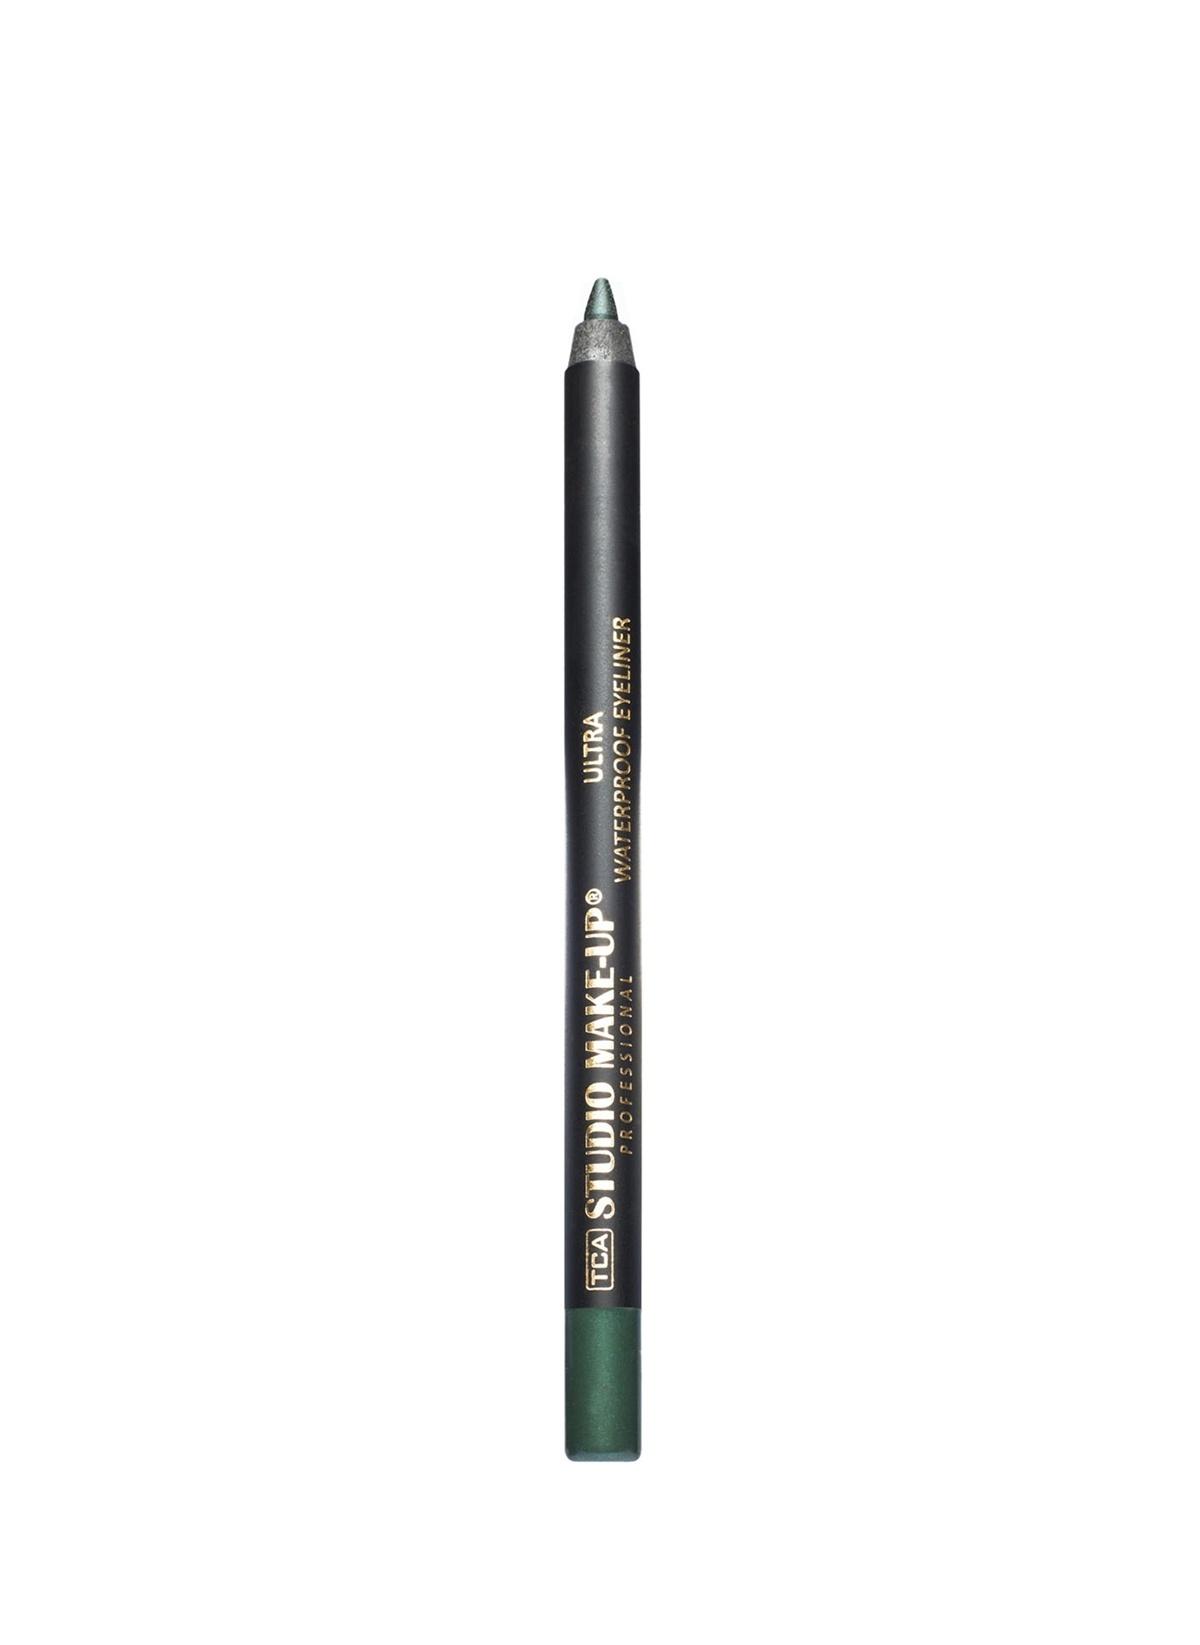 Tca Studio Make Up Ultrawaterproof Eyeliner 803 Dark Green Tca Studıo Make-up Ultrawaterproof Eyelı – 9.99 TL